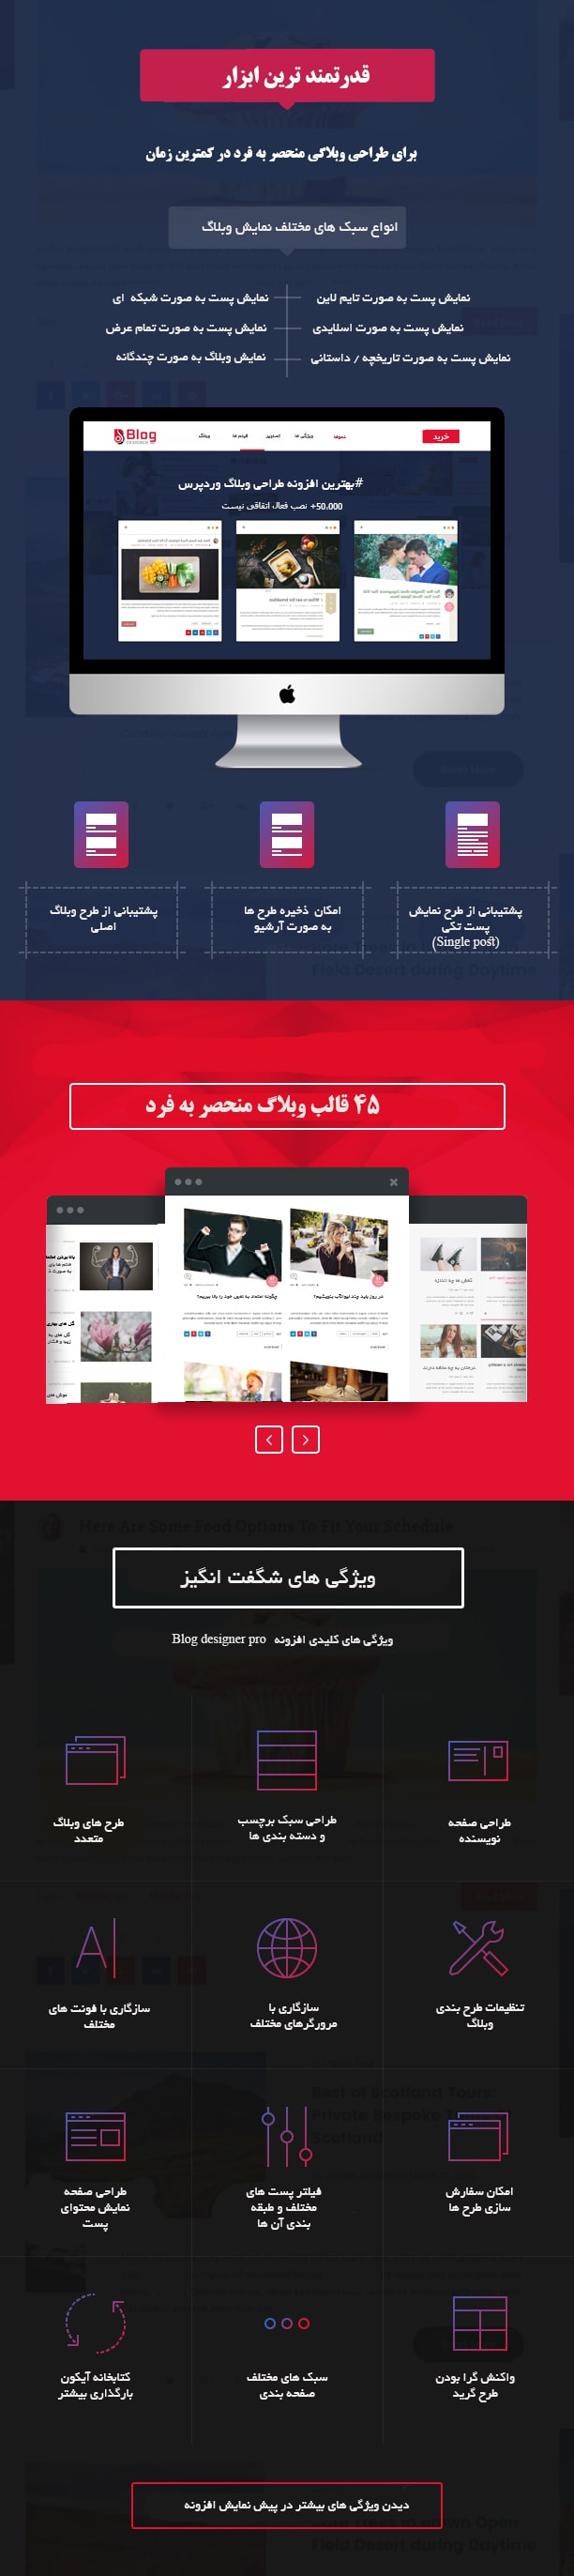 20718 a39486894dd200c1ffb23d767 - افزونه Blog Designer PRO | پلاگین طراحی وبلاگ وردپرس